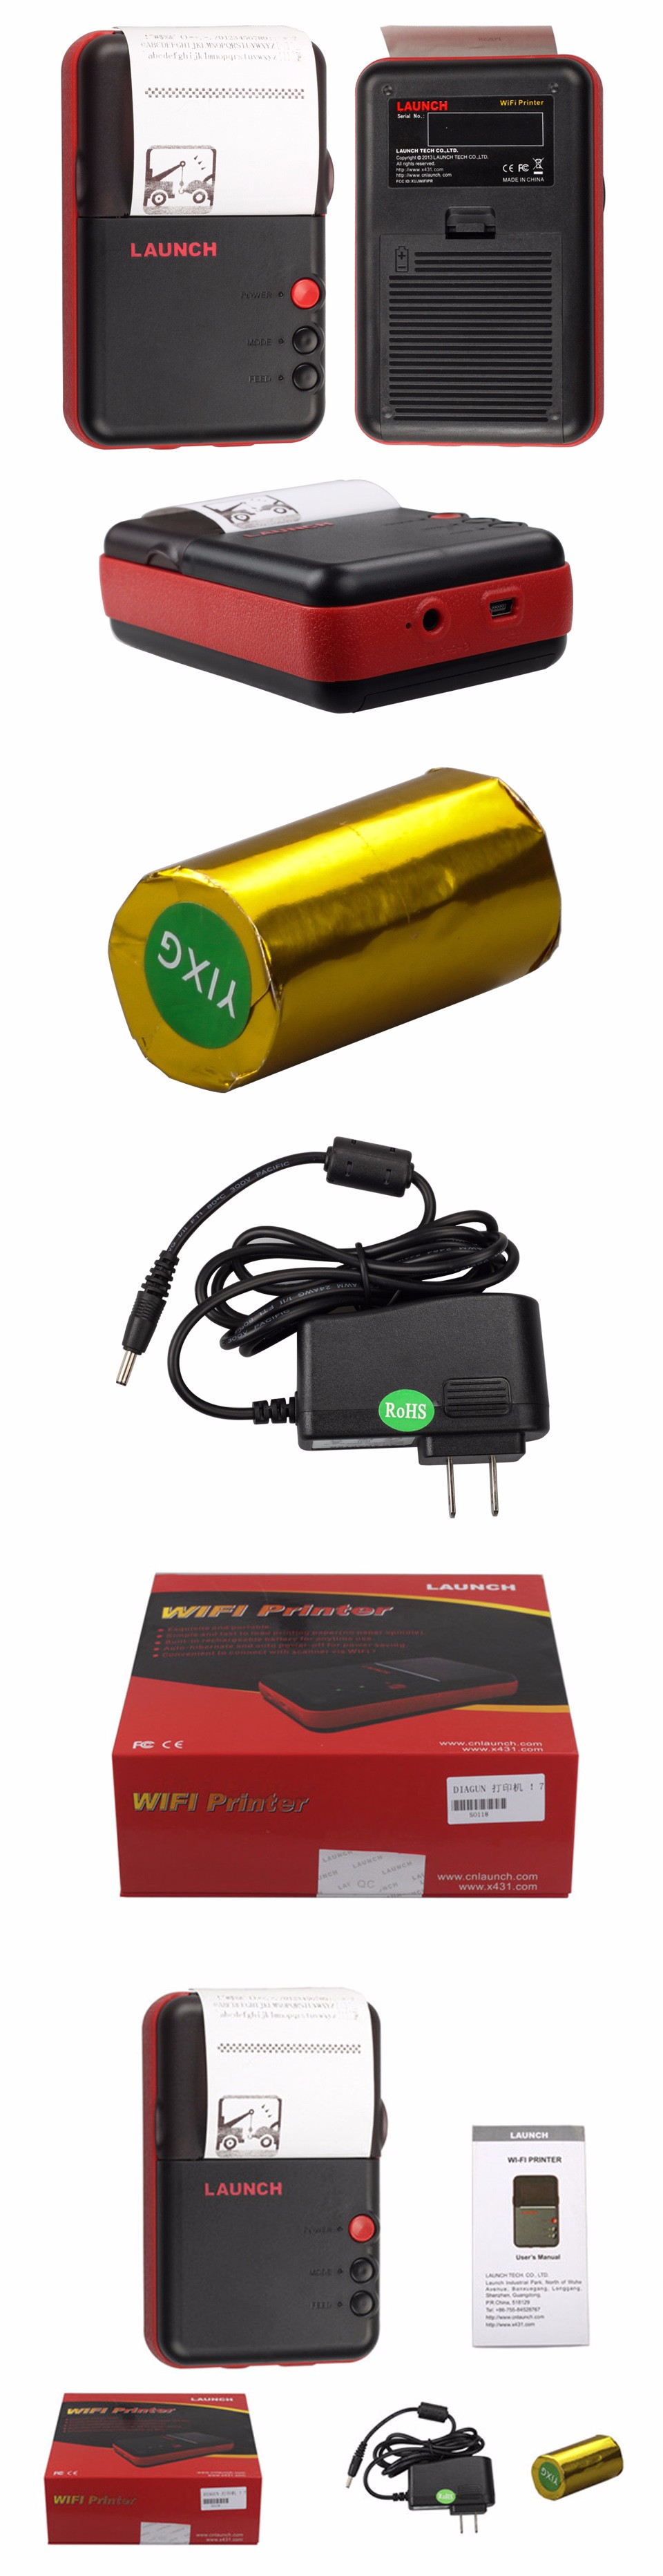 x431 vmini printer 960